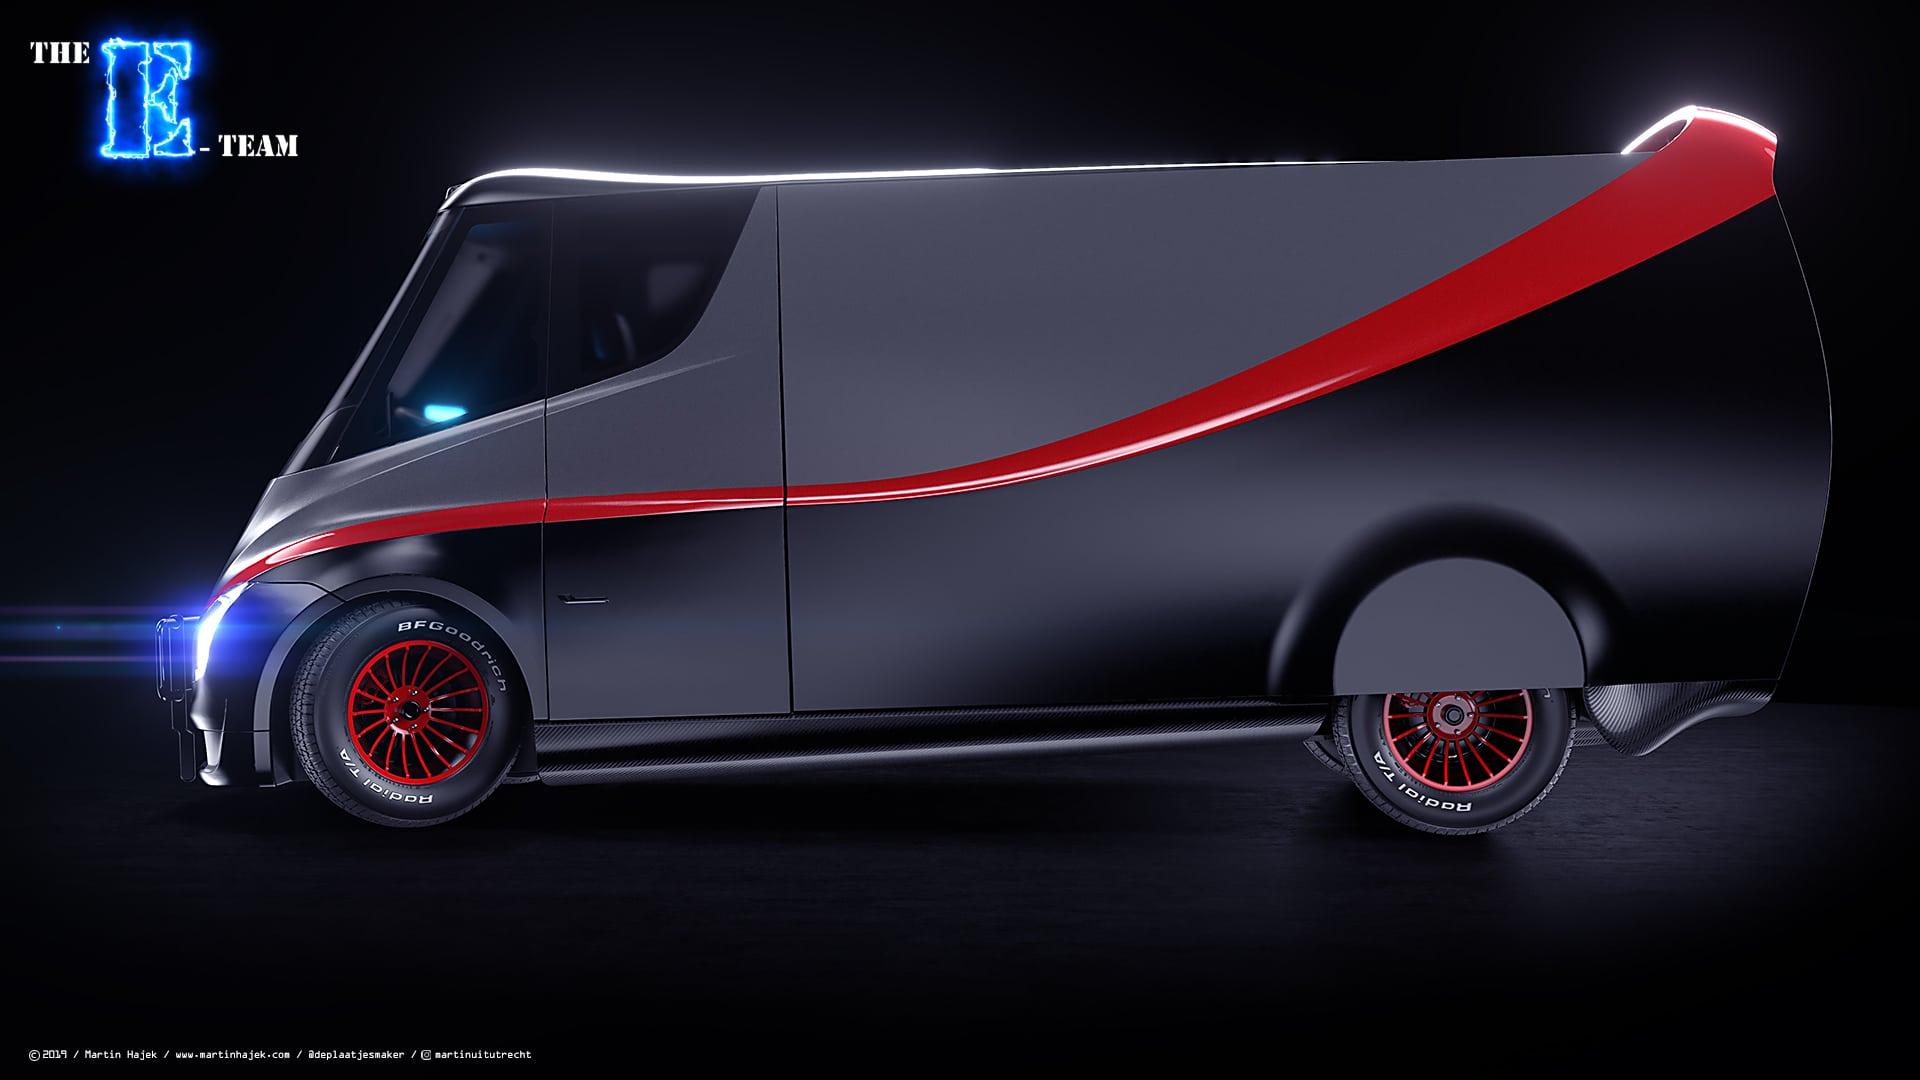 E-Team van concept by Martin Hajek / www.martinhajek.com